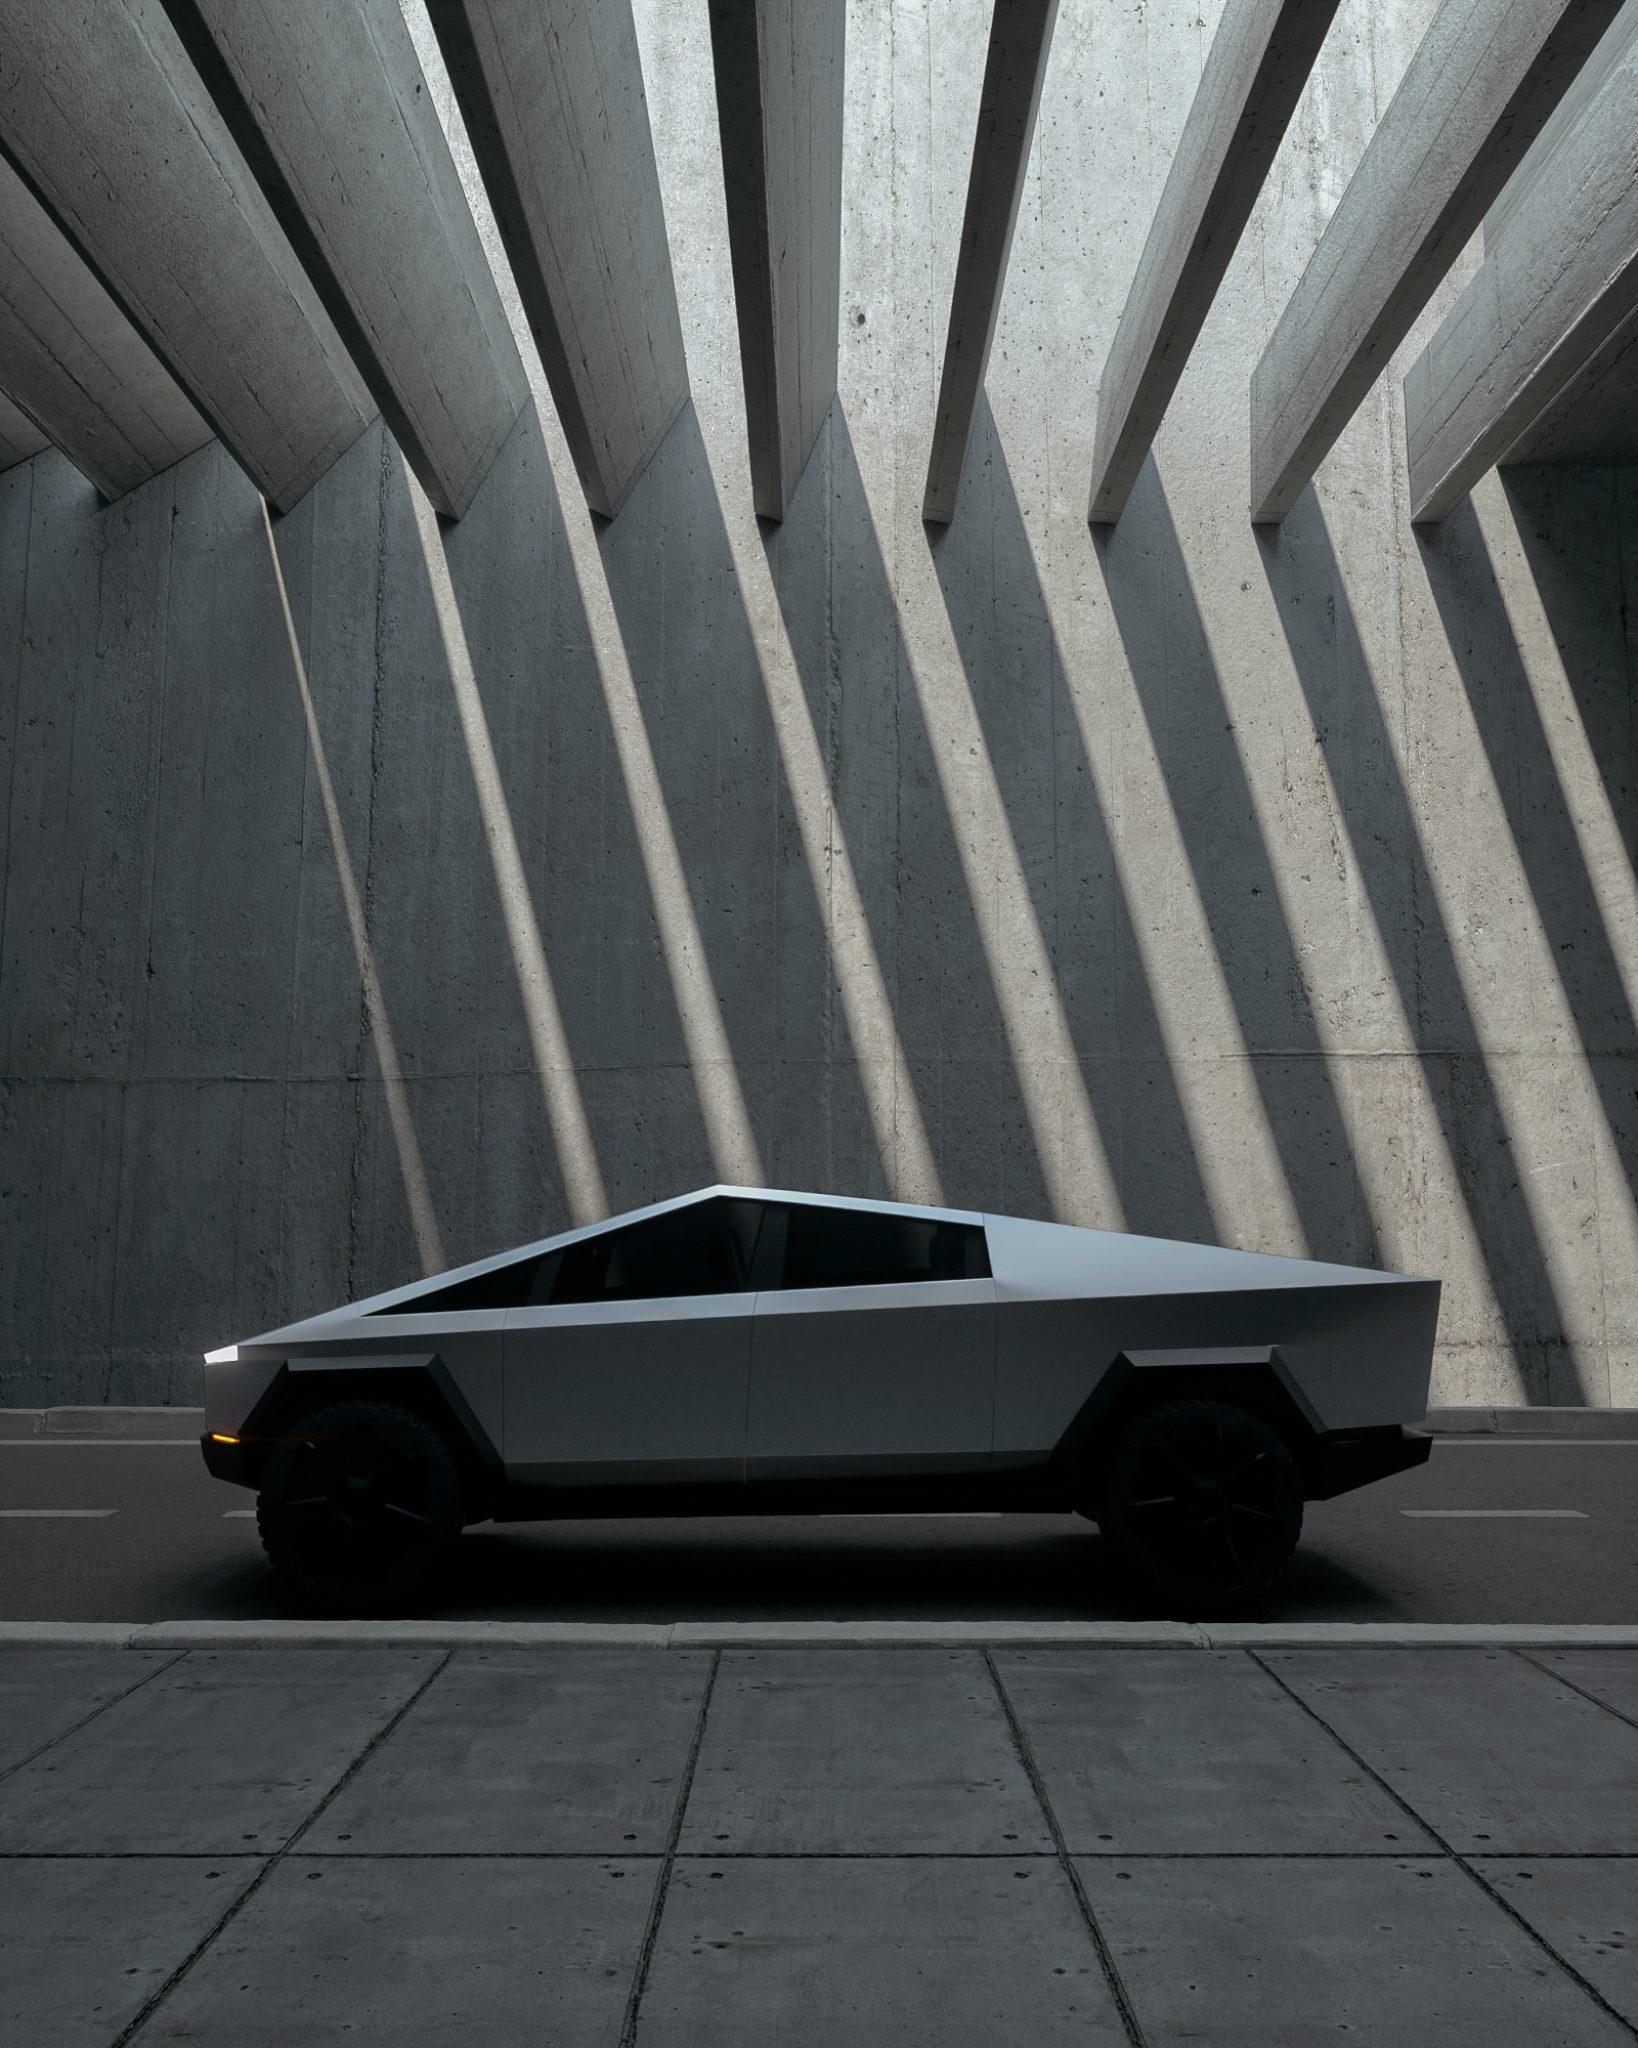 ignant-tesla-cybertruck-cgi-brutalism-cgi-editorial-5-1638×2048